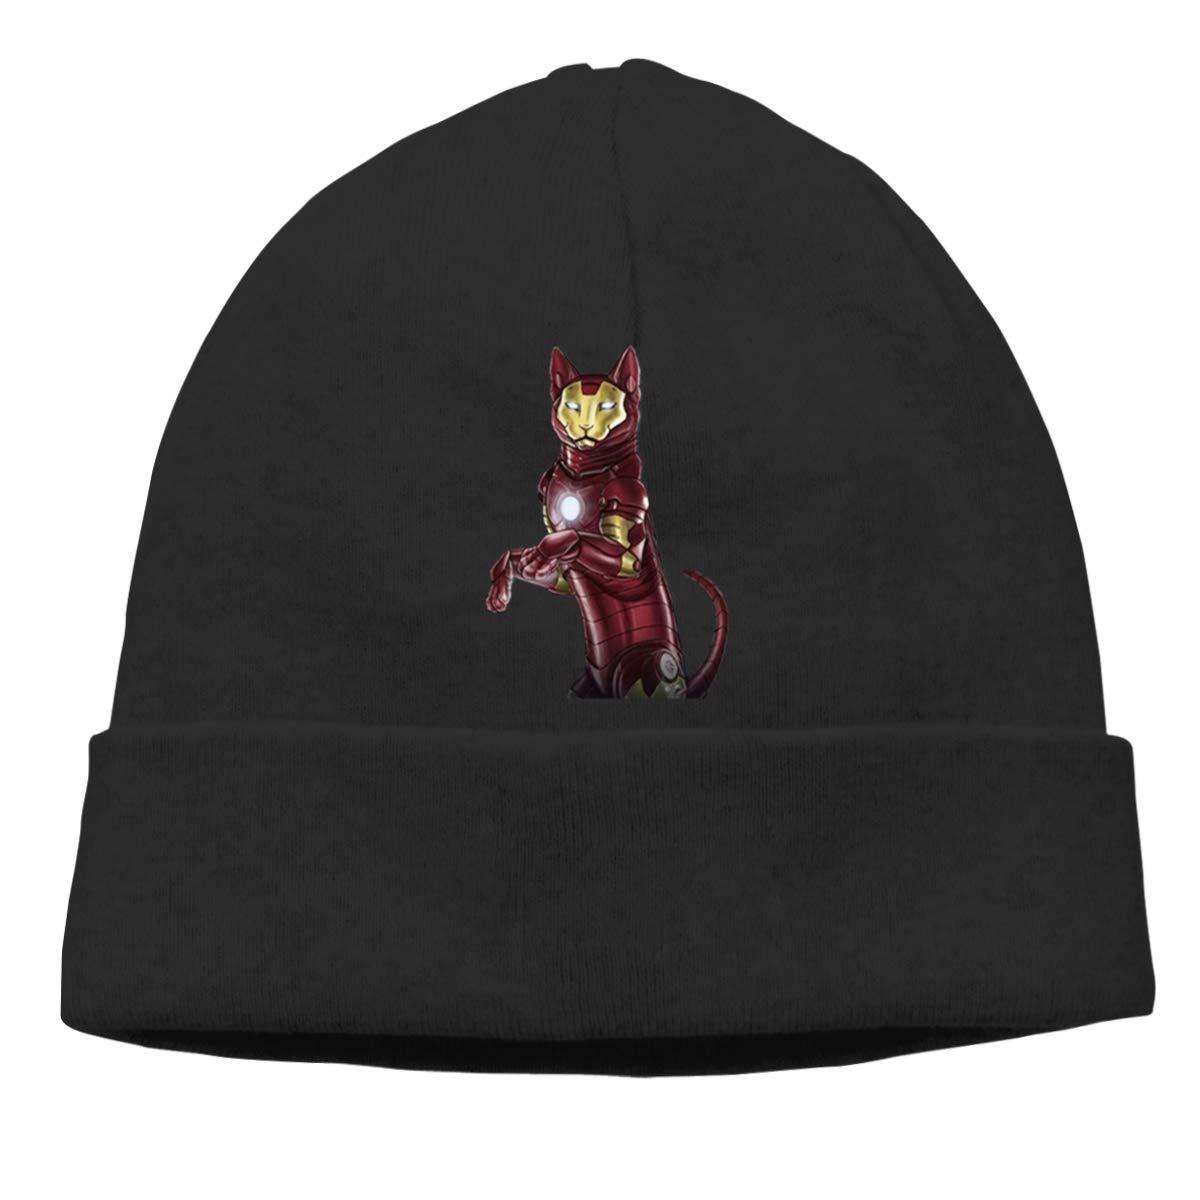 Iron Cat Unisex Cuffed Plain Skull Knitted Hat Beanie Cap Men Women Black